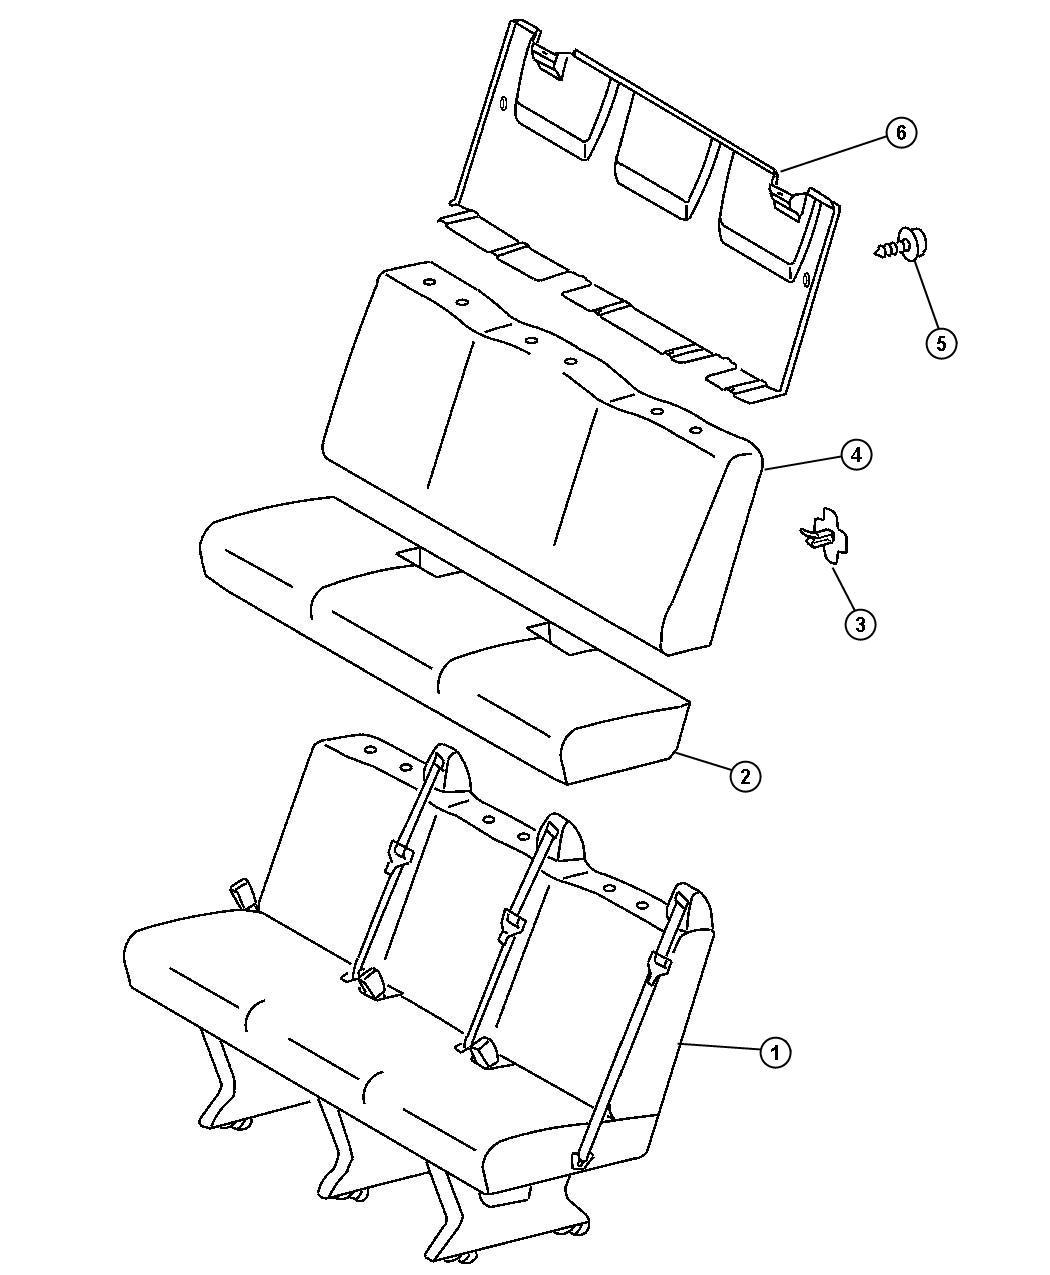 Dodge Sprinter Panel Seat Back Two Passenger Rear Hood Bench